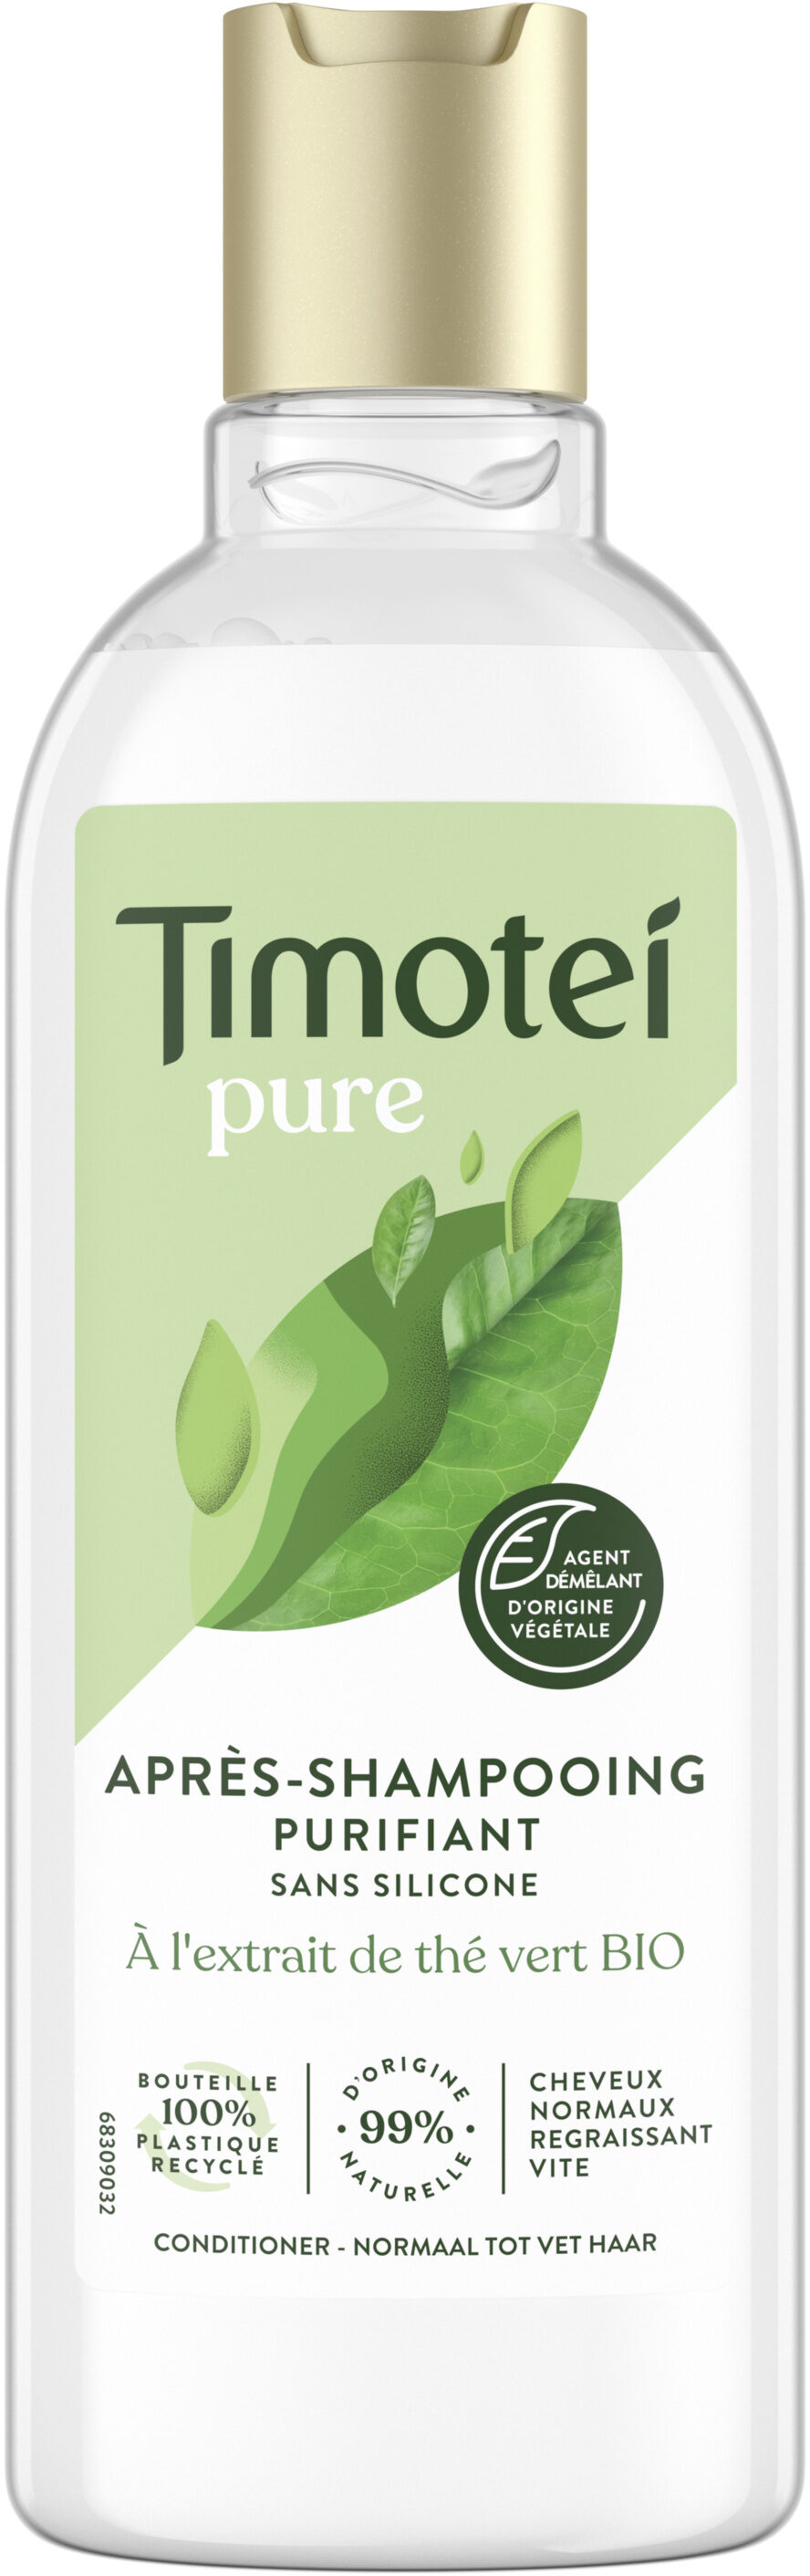 Timotei Après-Shampooing Femme Pure - Product - fr